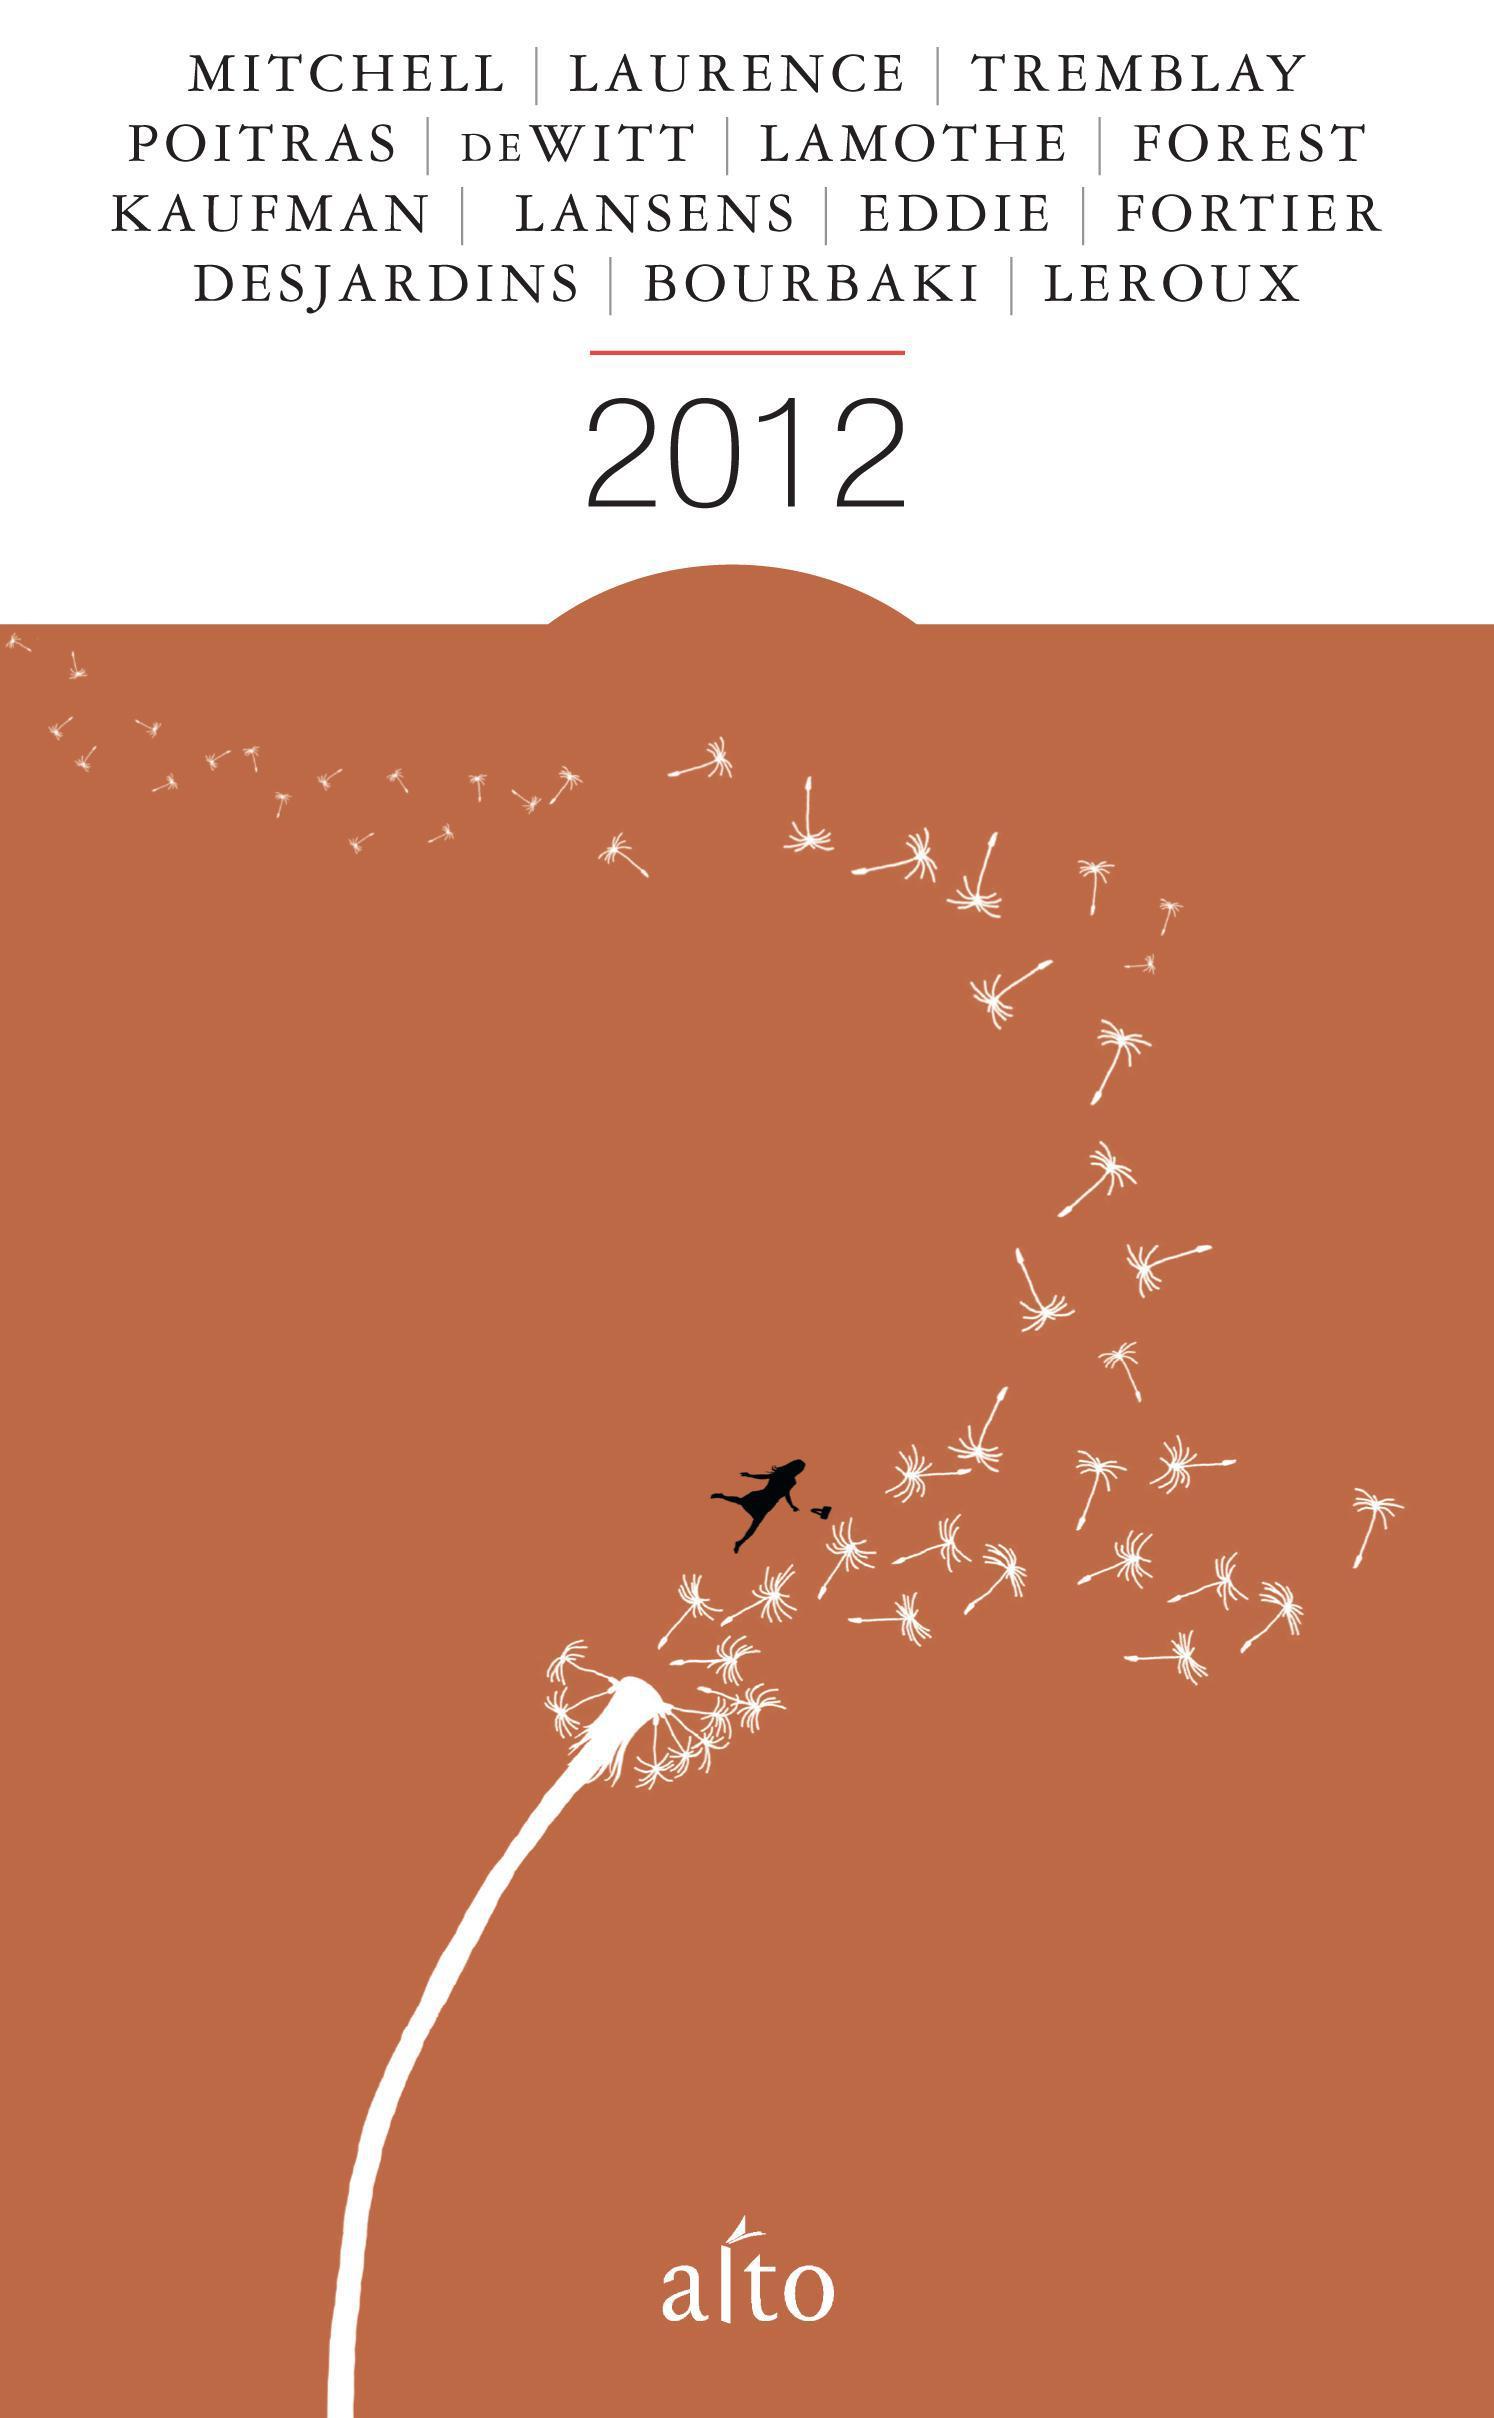 Alto 2012